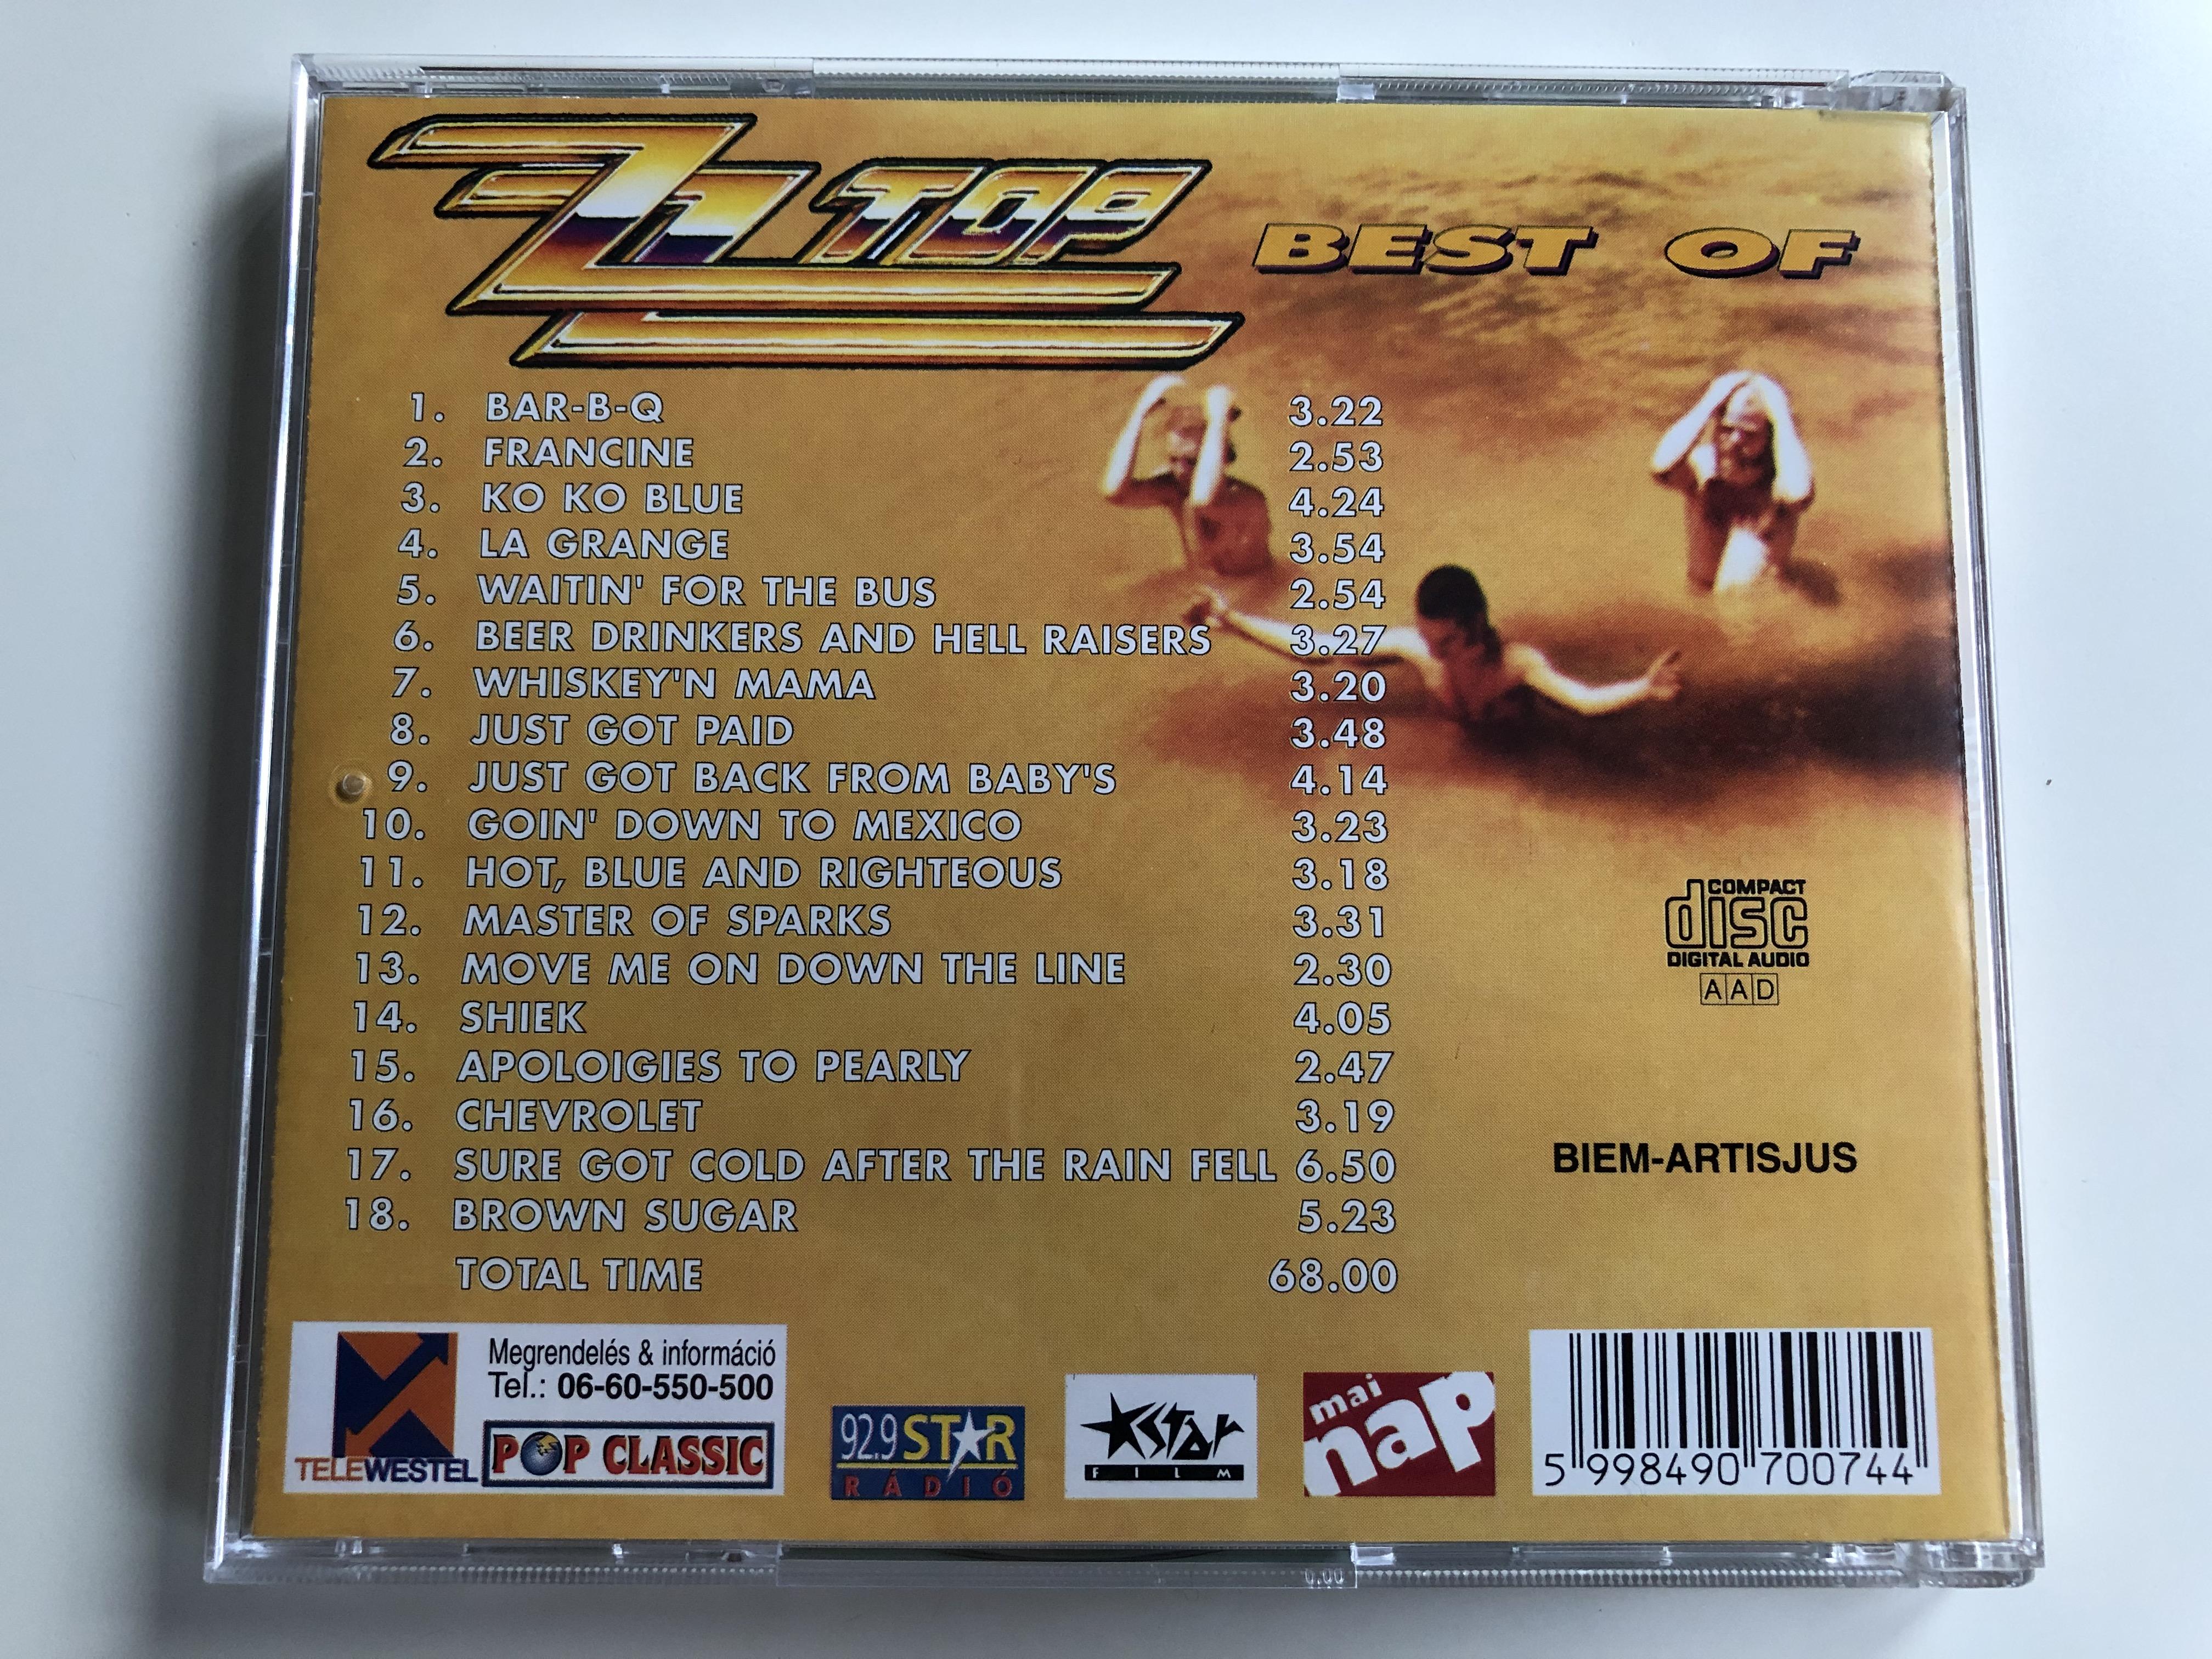 zz-top-best-of-pop-classic-euroton-audio-cd-eucd-0074-3-.jpg